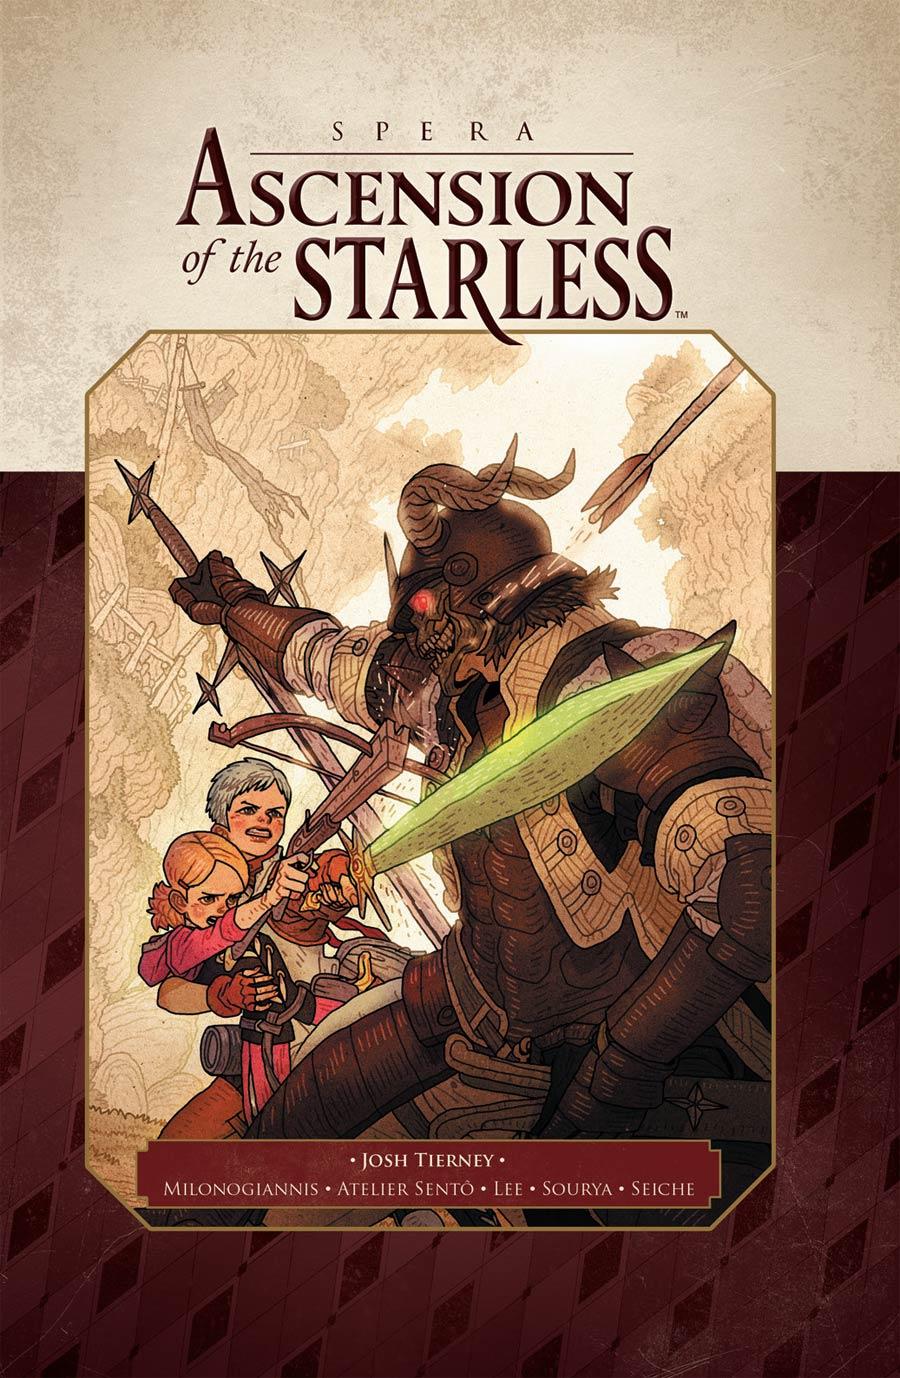 Spera Ascension Of The Starless Vol 1 HC